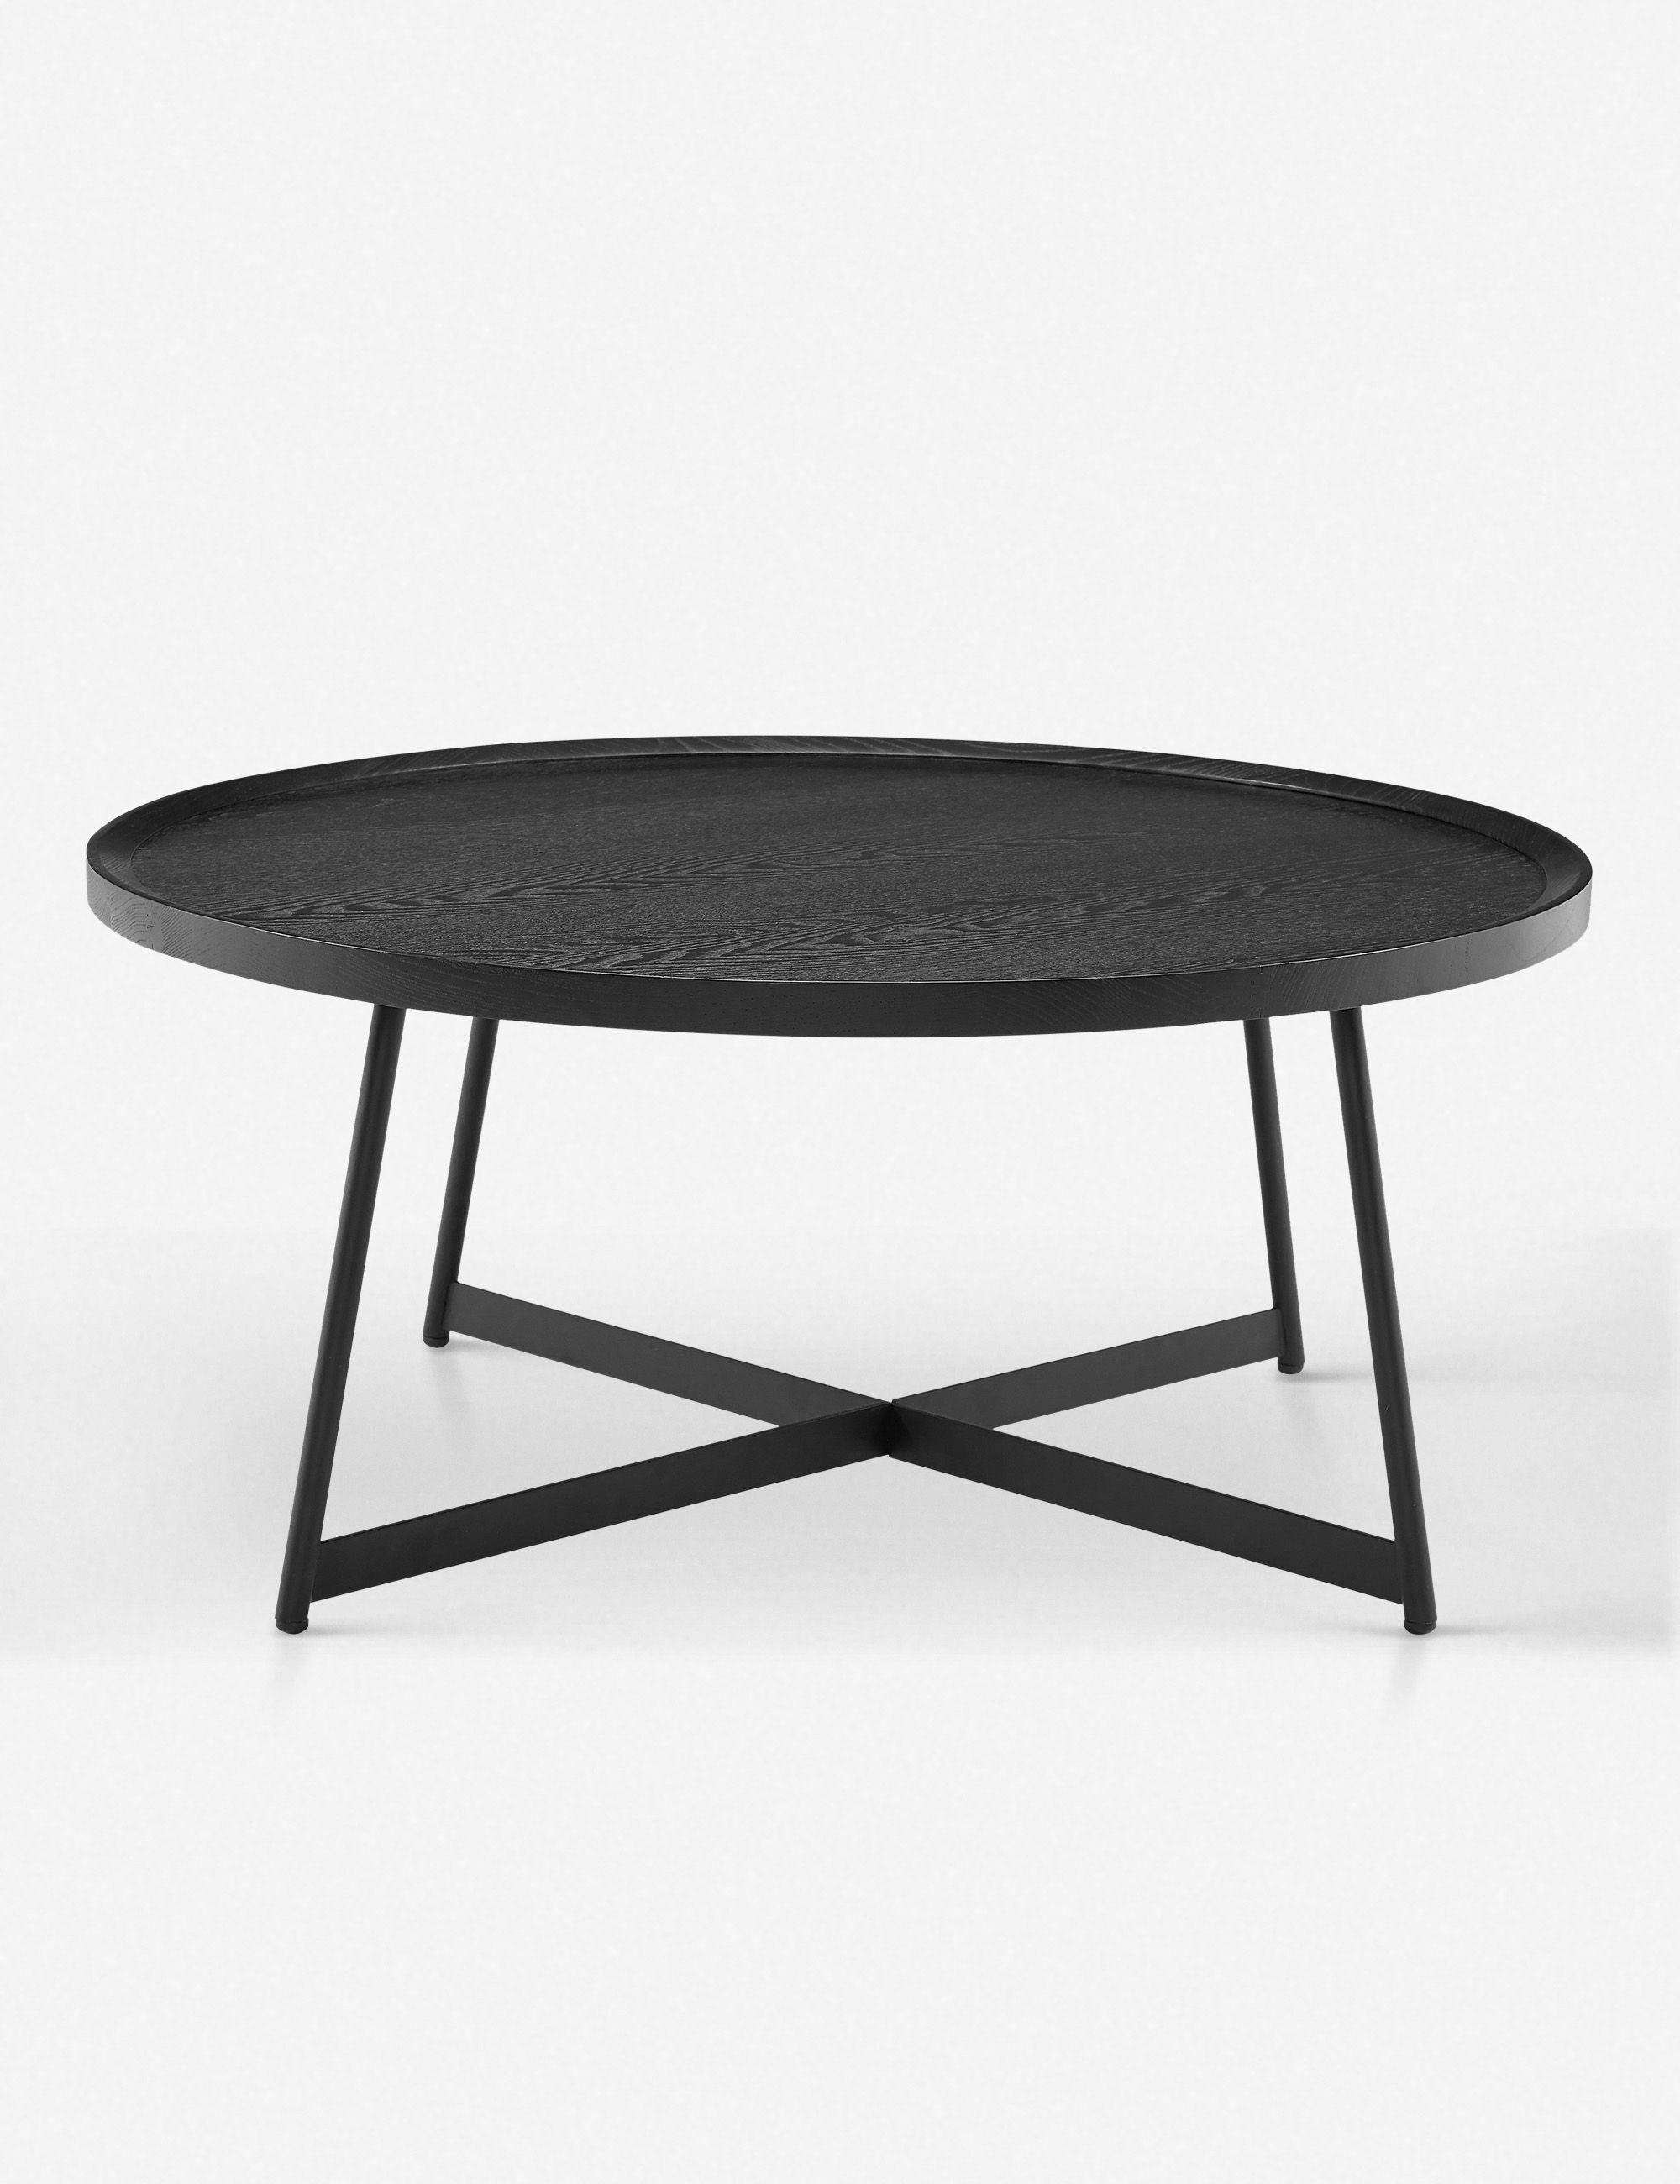 Gweneth Round Coffee Table Black Ash Round Coffee Table Coffee Table Marble Round Coffee Table [ 2600 x 2000 Pixel ]